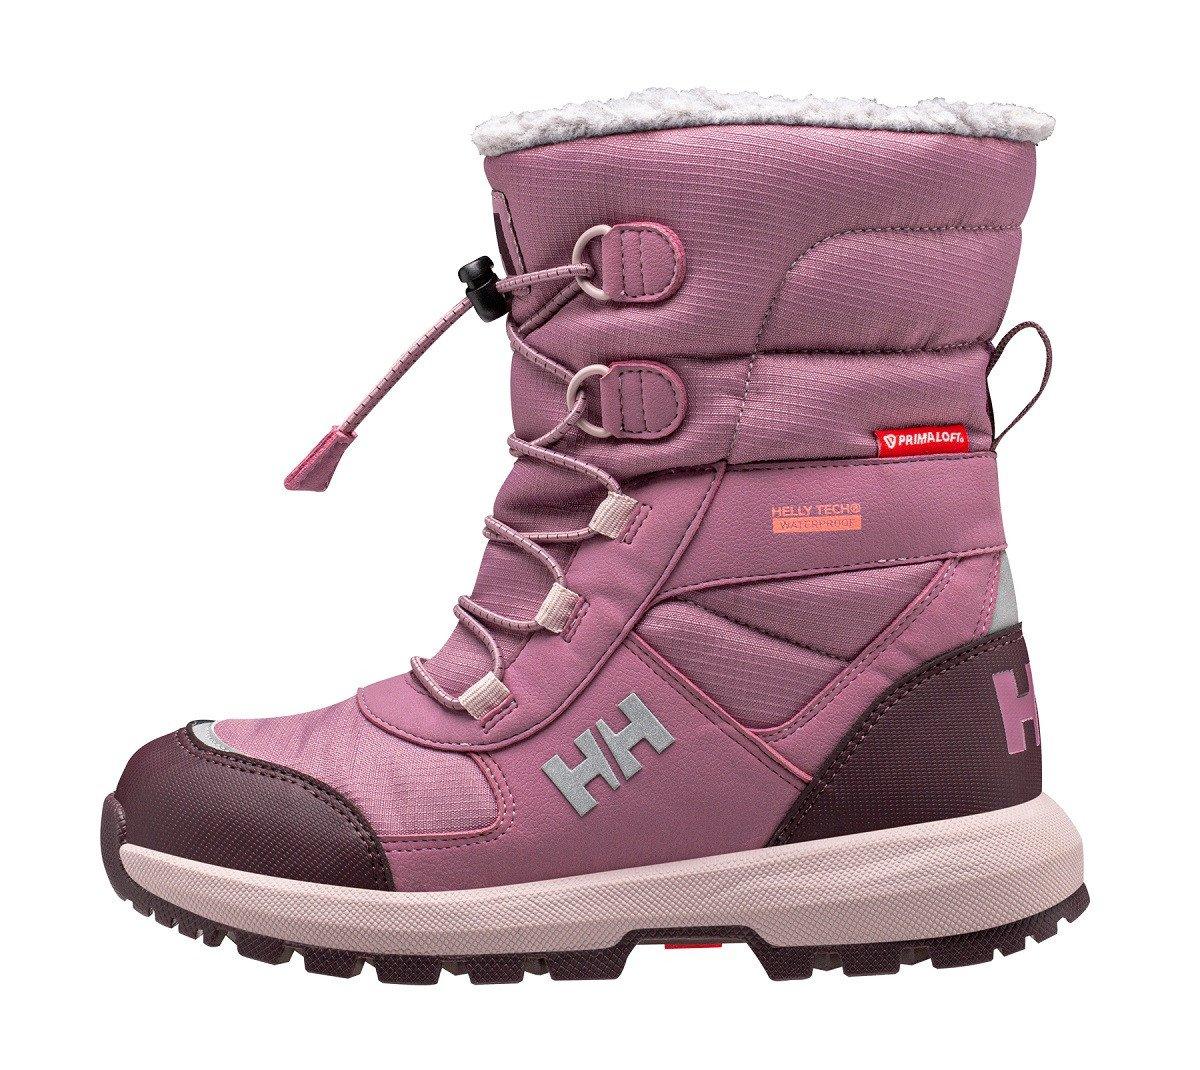 Helly Hansen Silverton Vinterstøvler Børn, pink